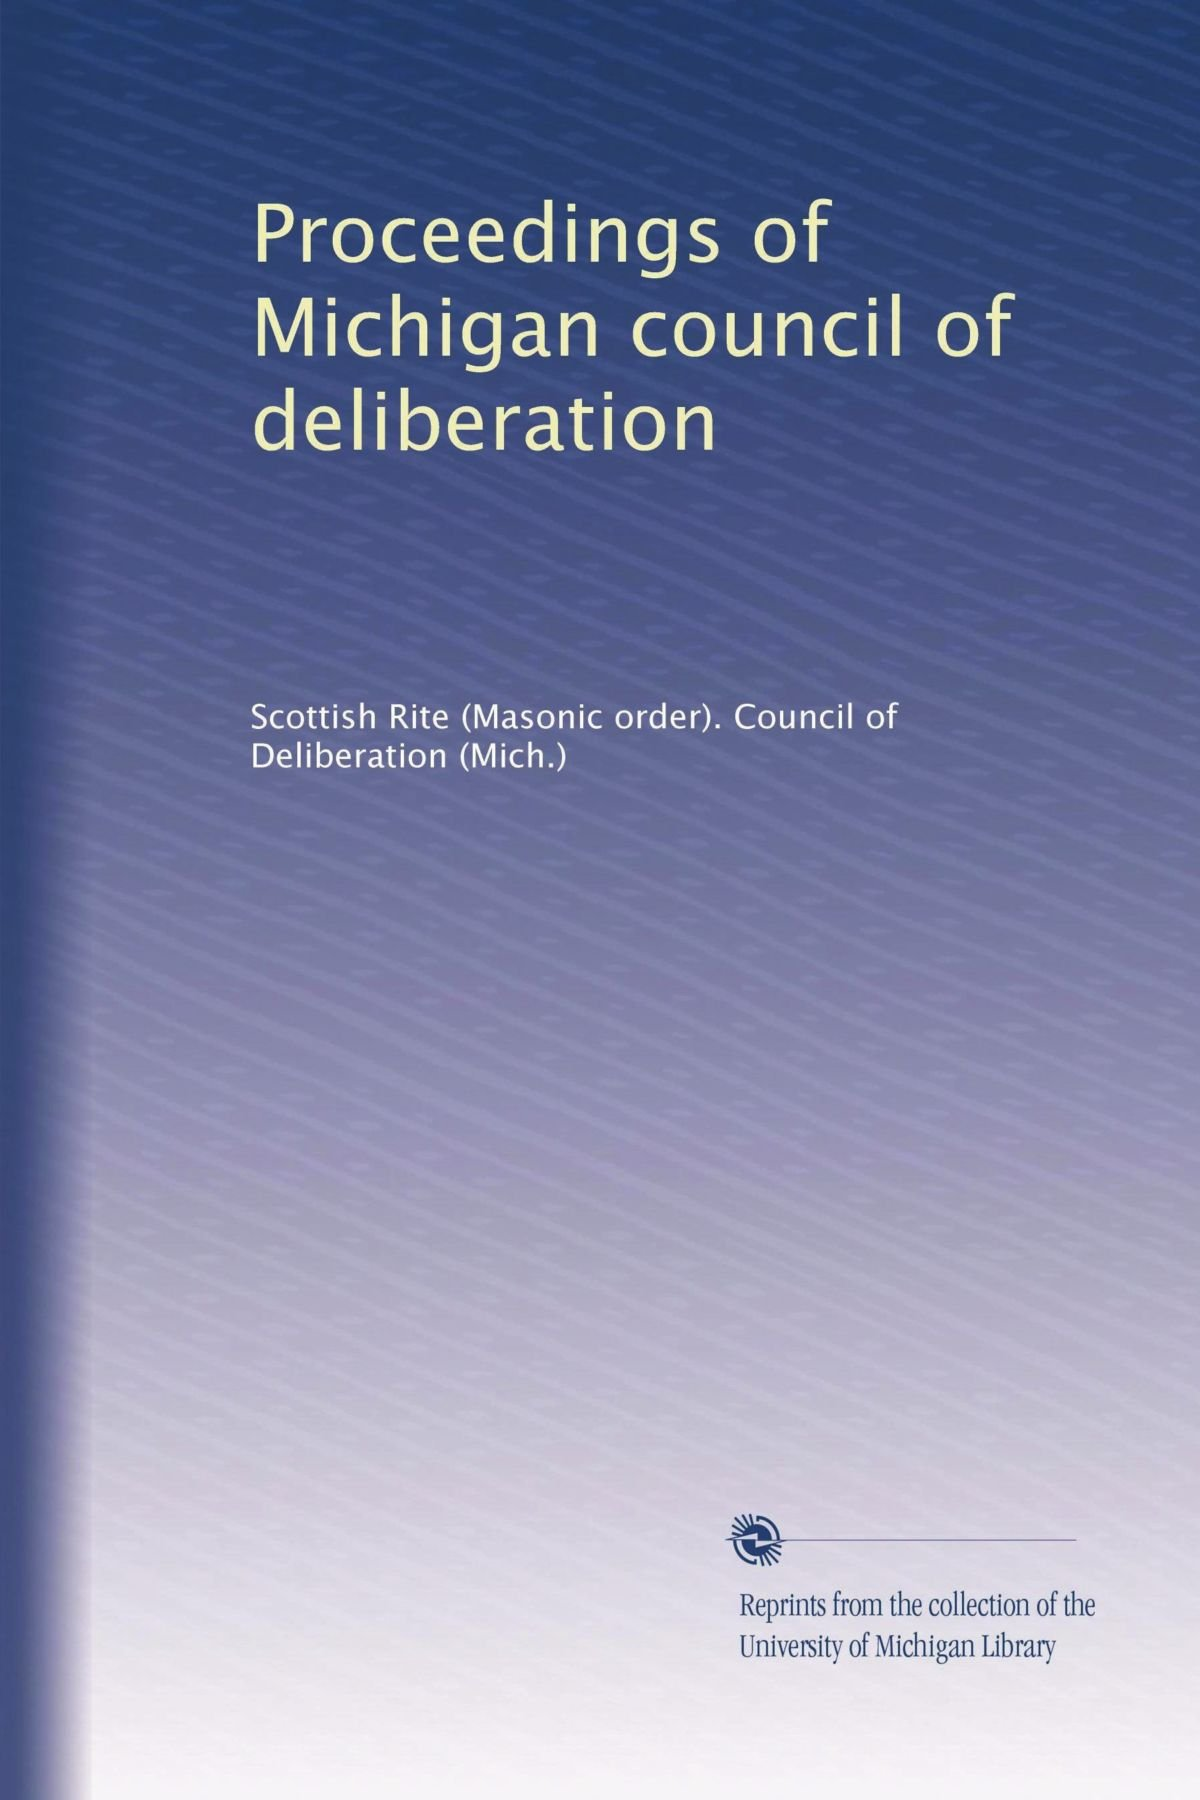 Proceedings of Michigan council of deliberation PDF